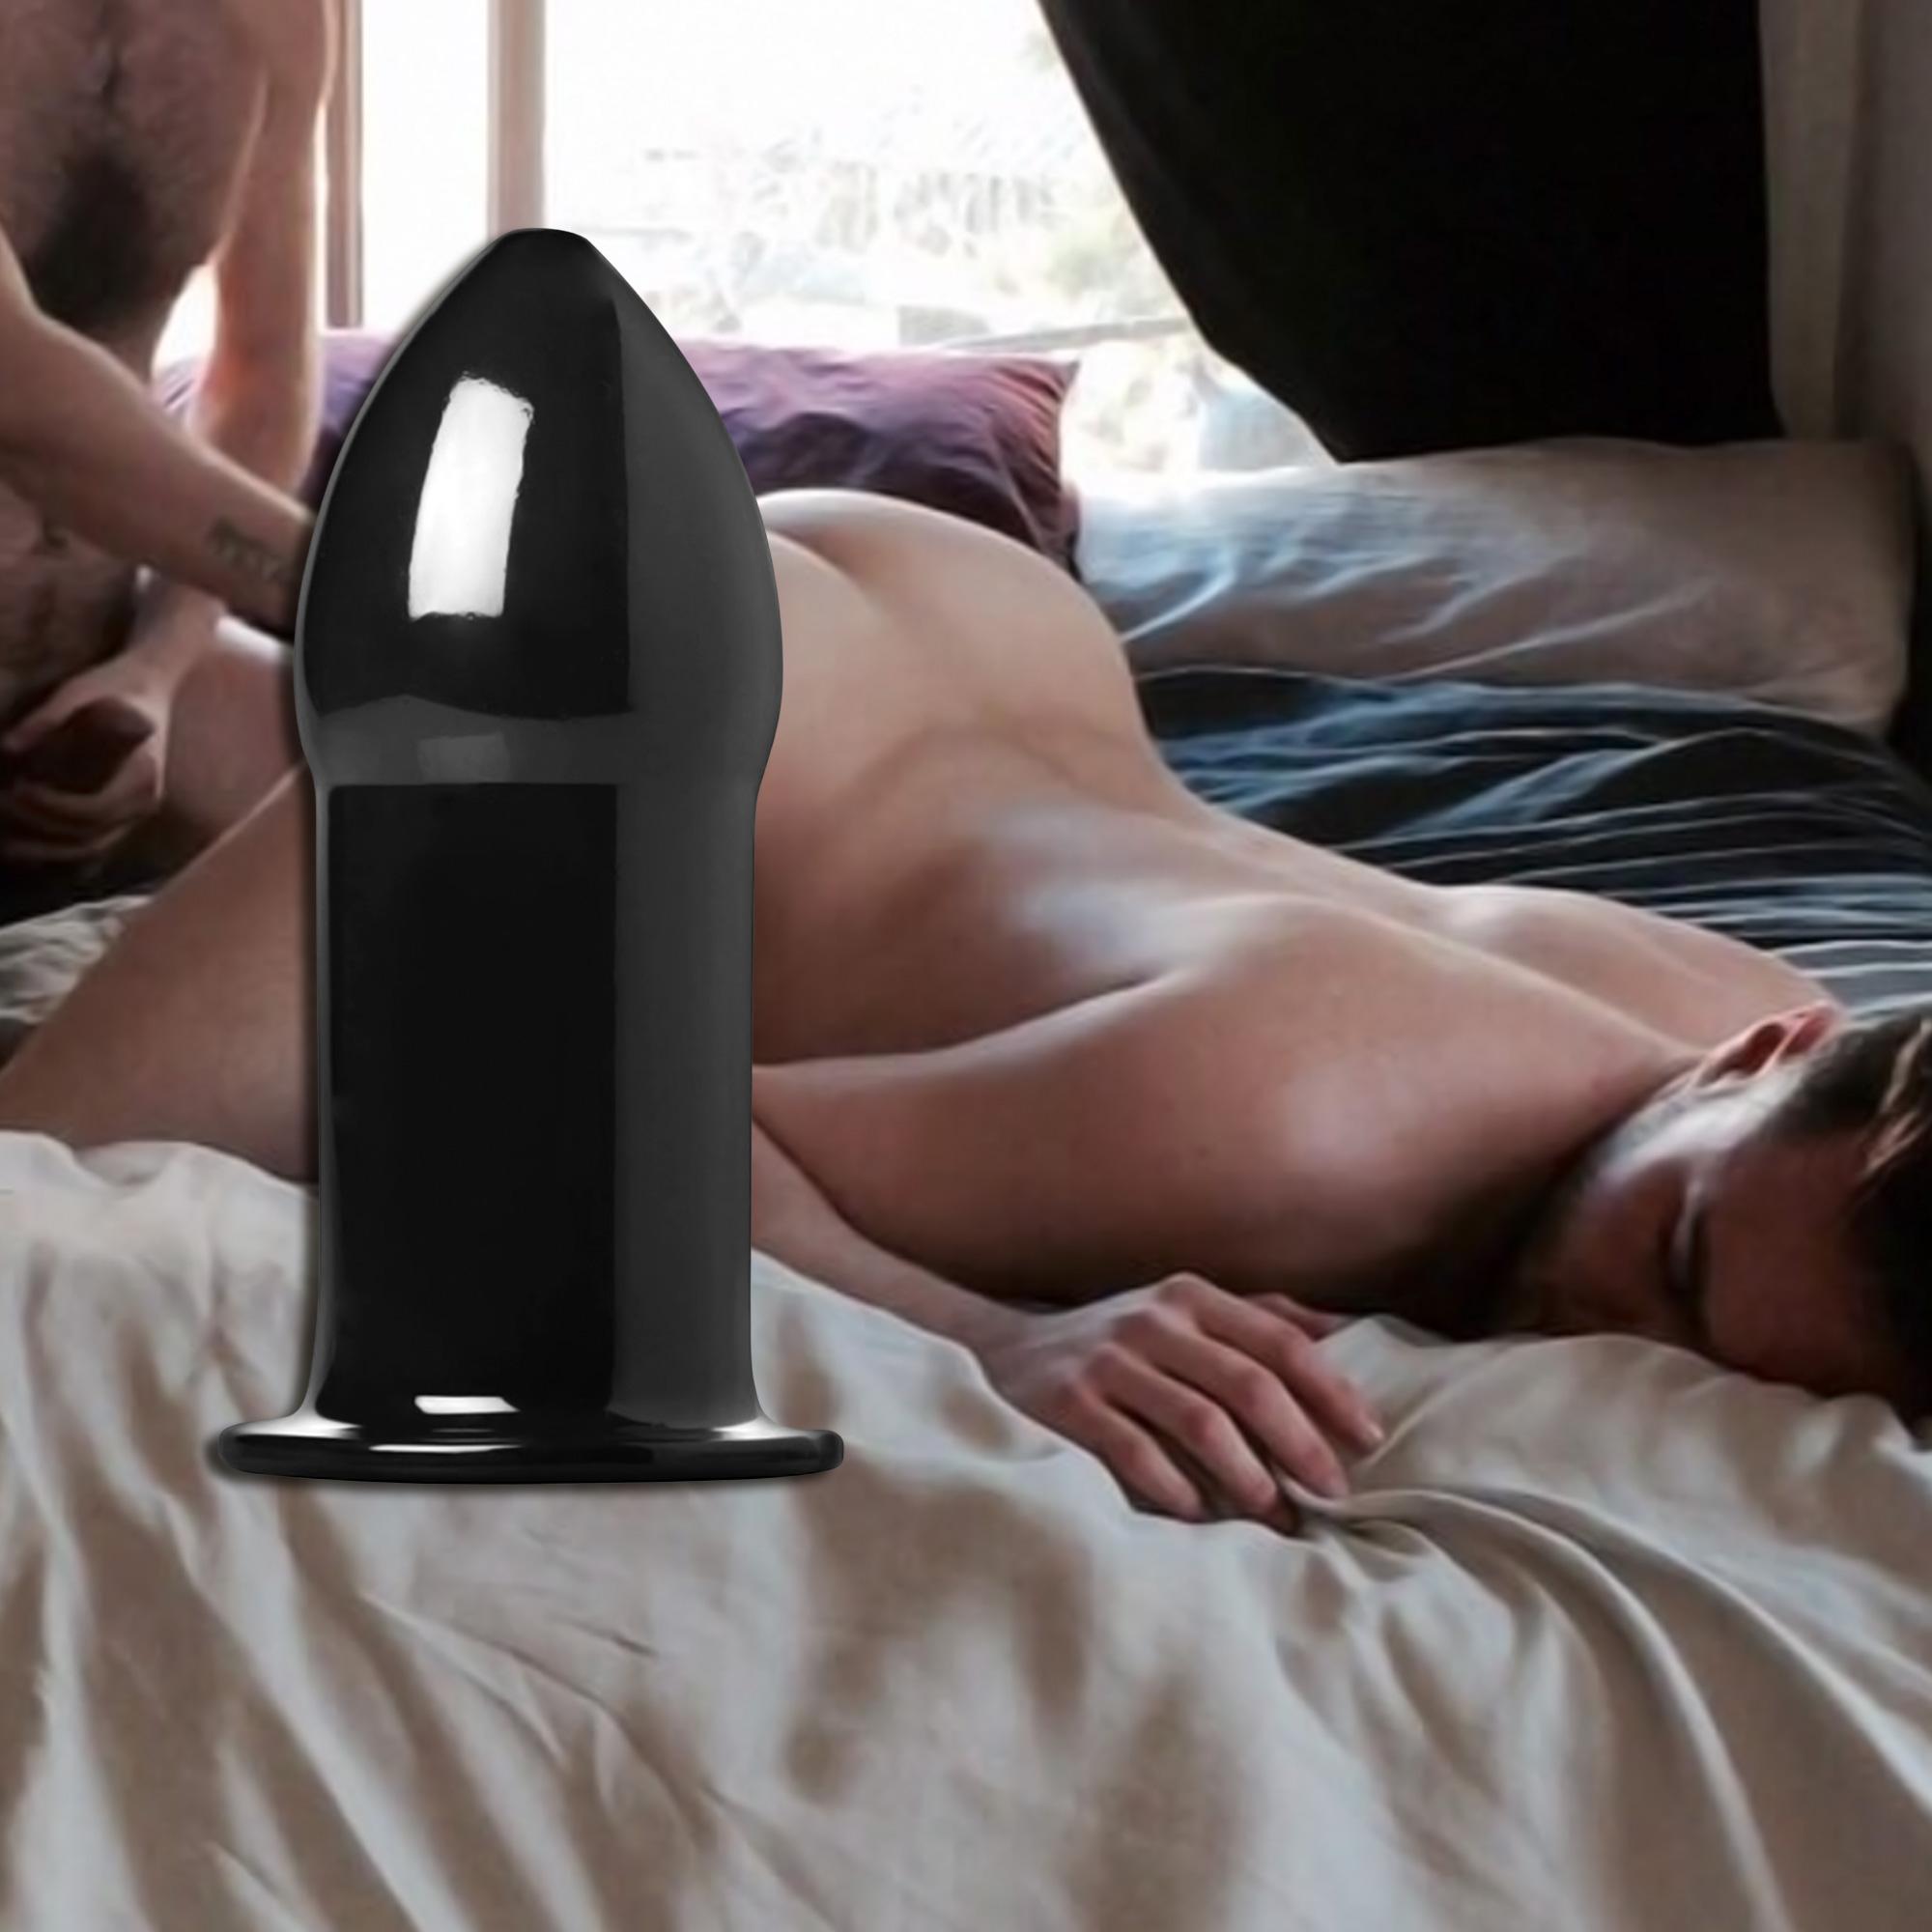 Erotic anal stretching stories